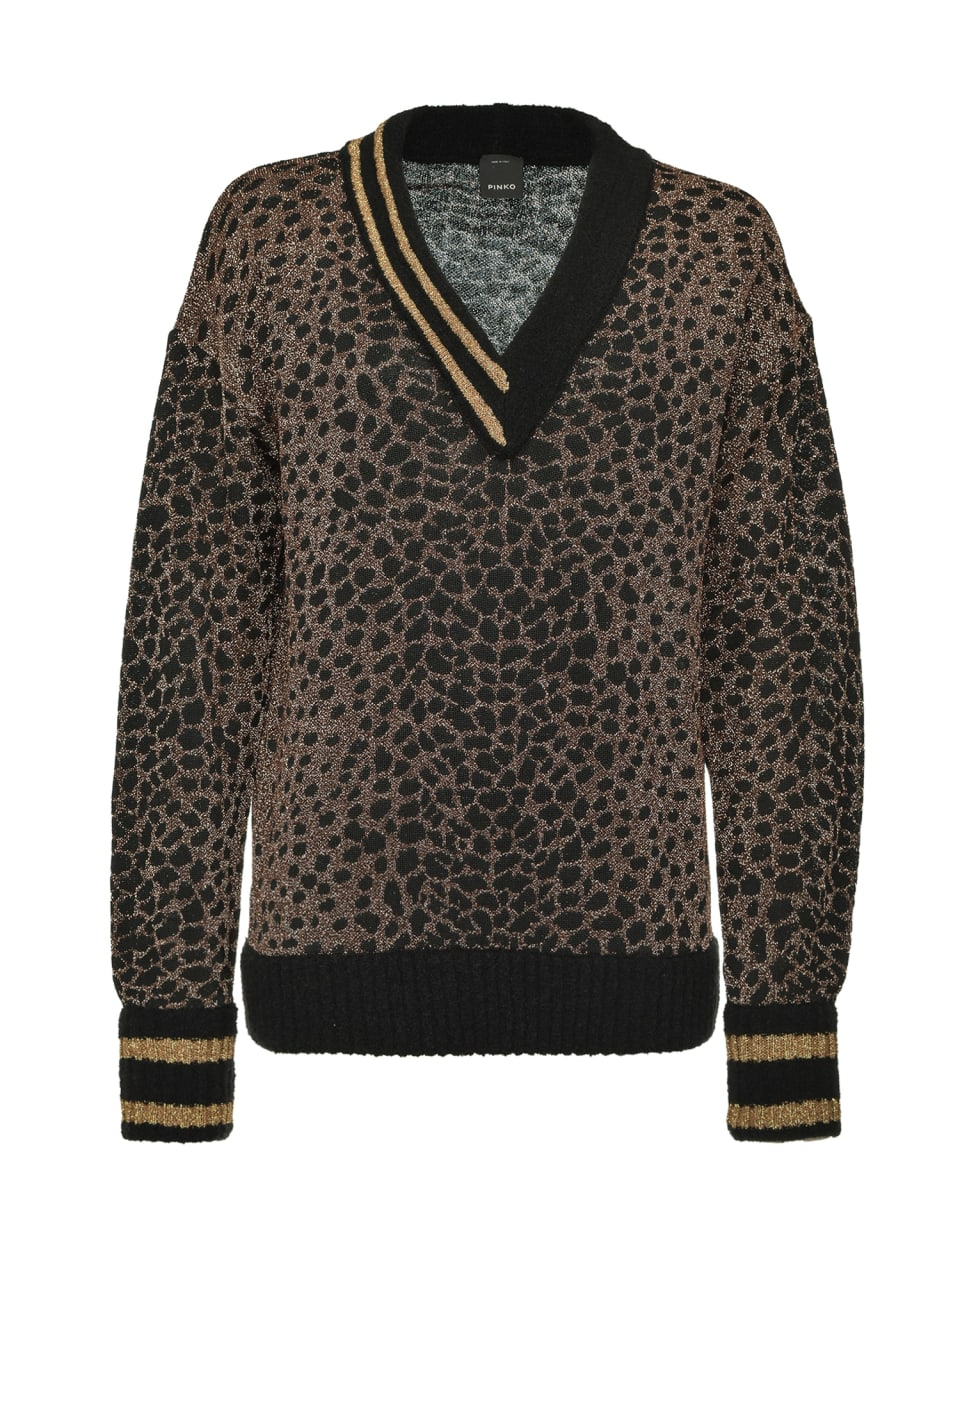 Ocelot jacquard lurex knit pullover - Pinko